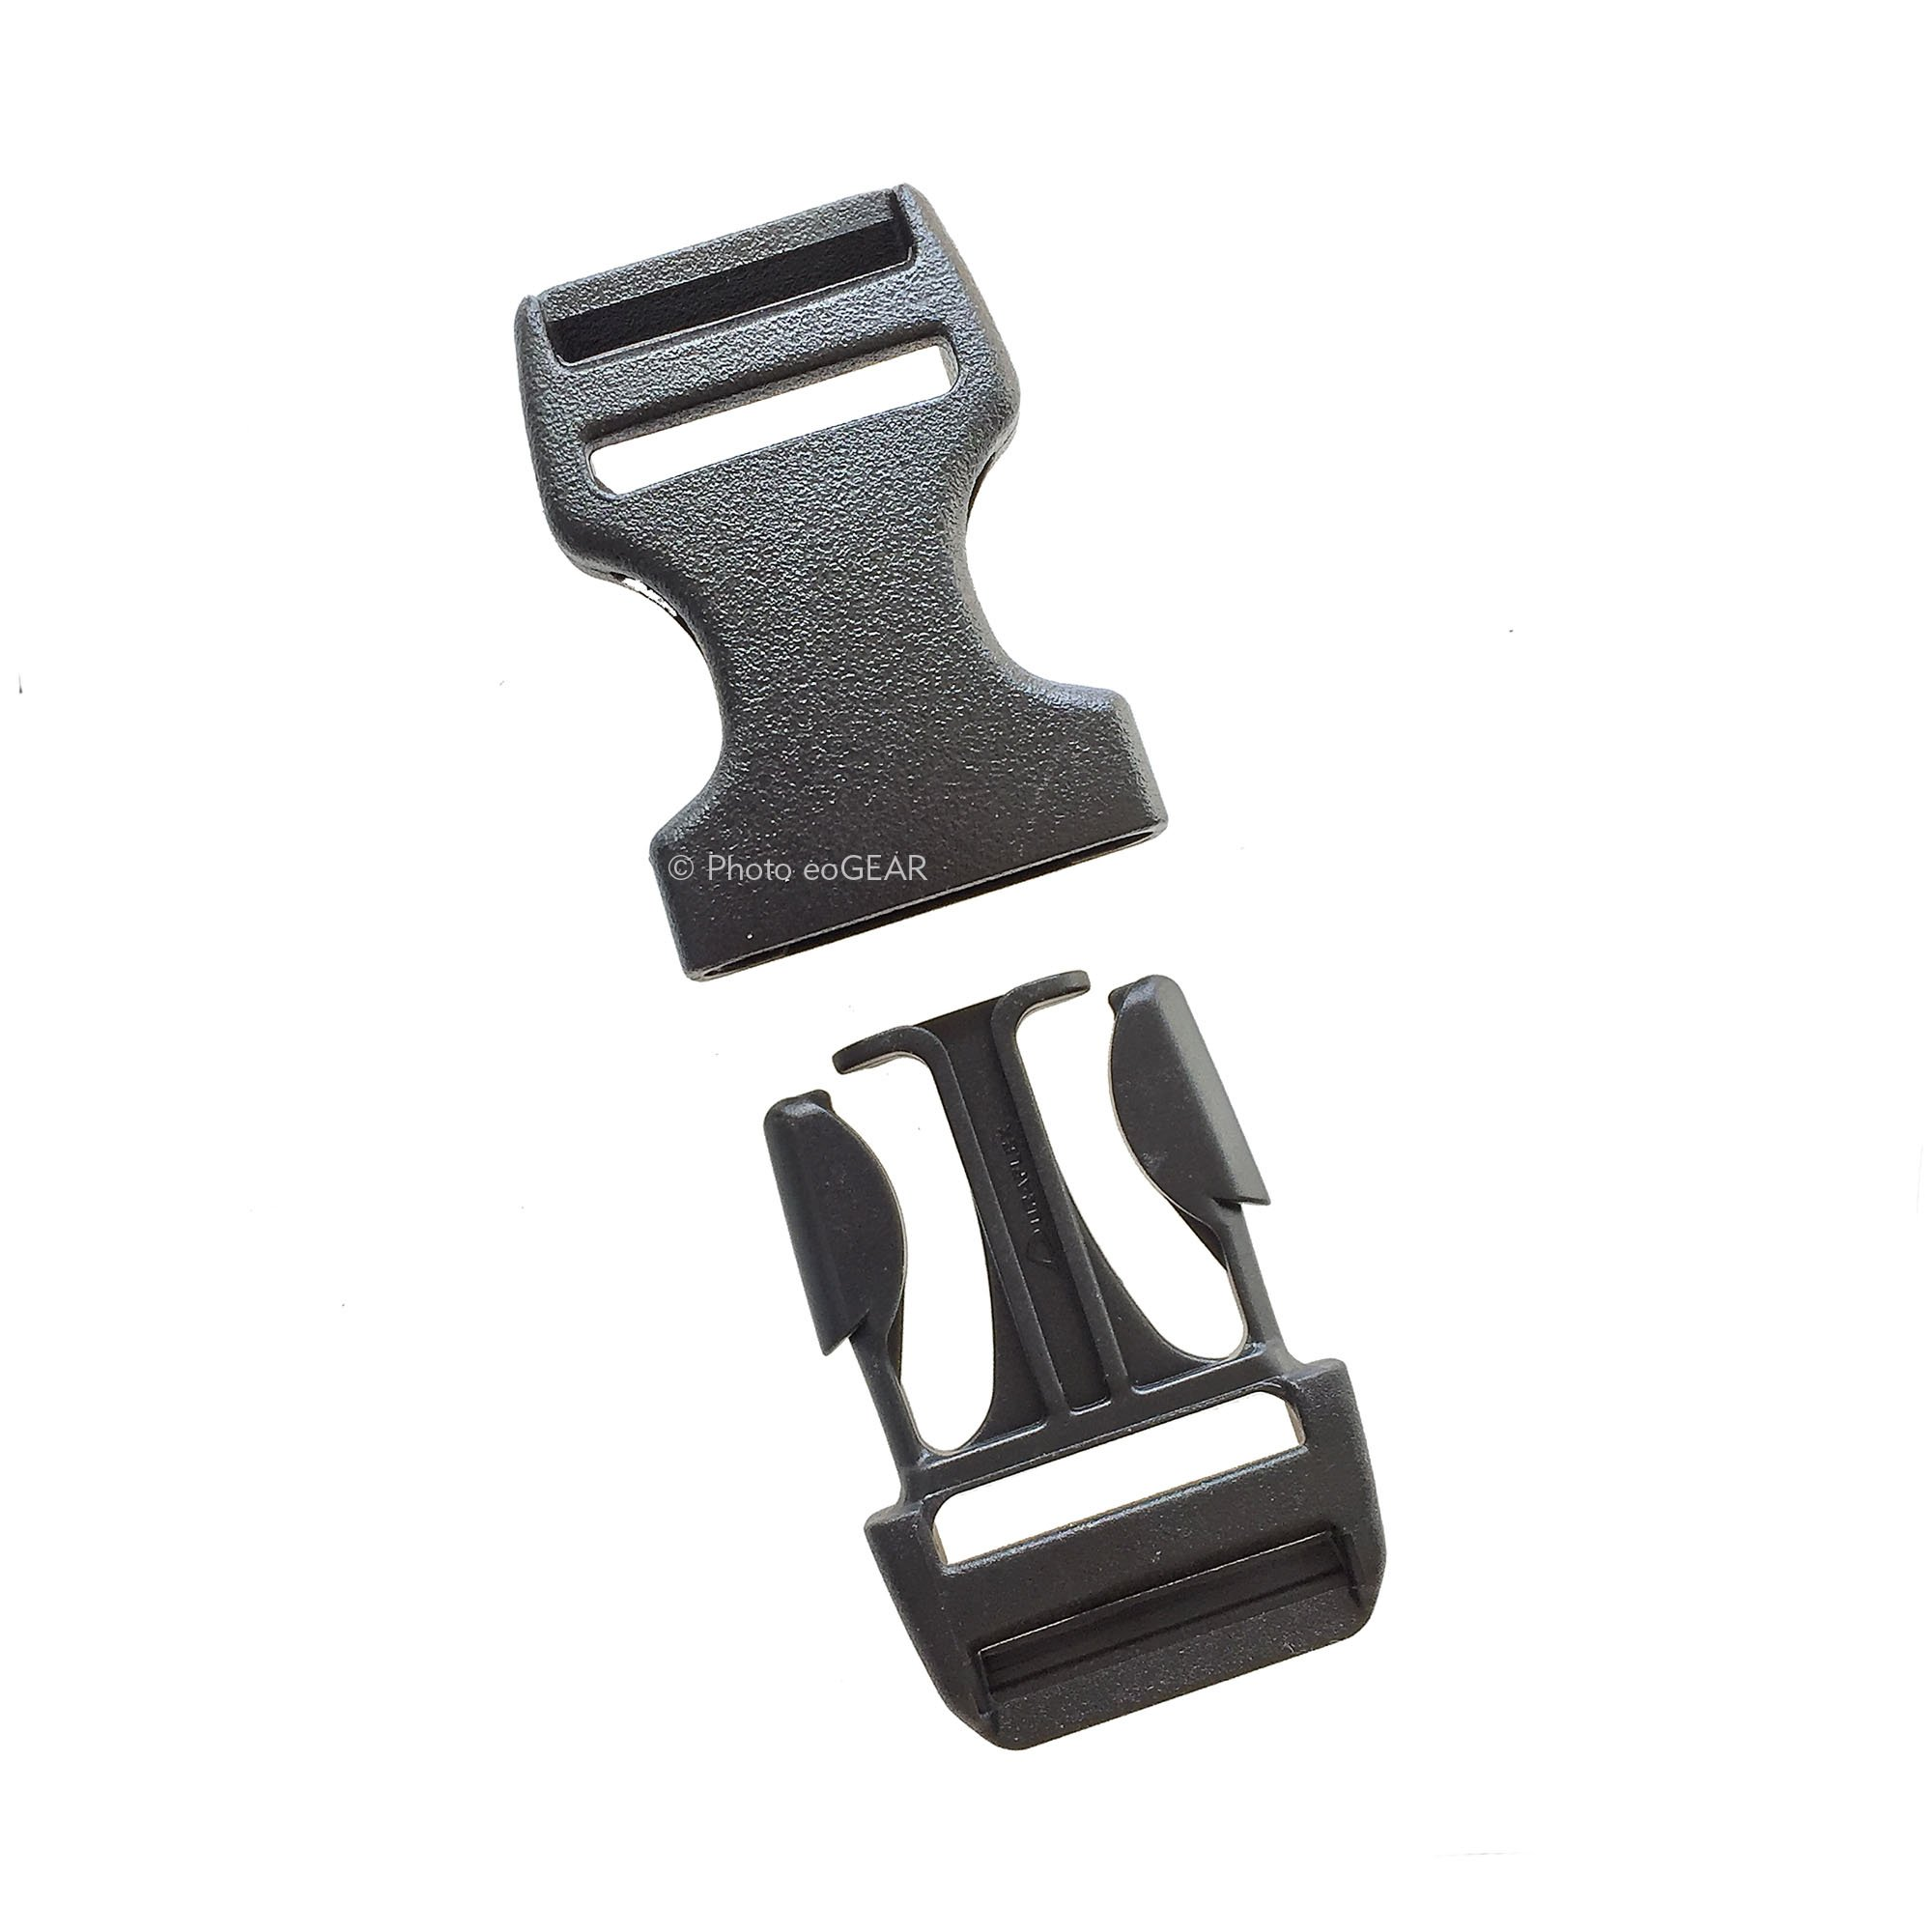 Duraflex Dual Adjust Stealth Quick-Release Buckle (1'' / 25mm) 10 Pak